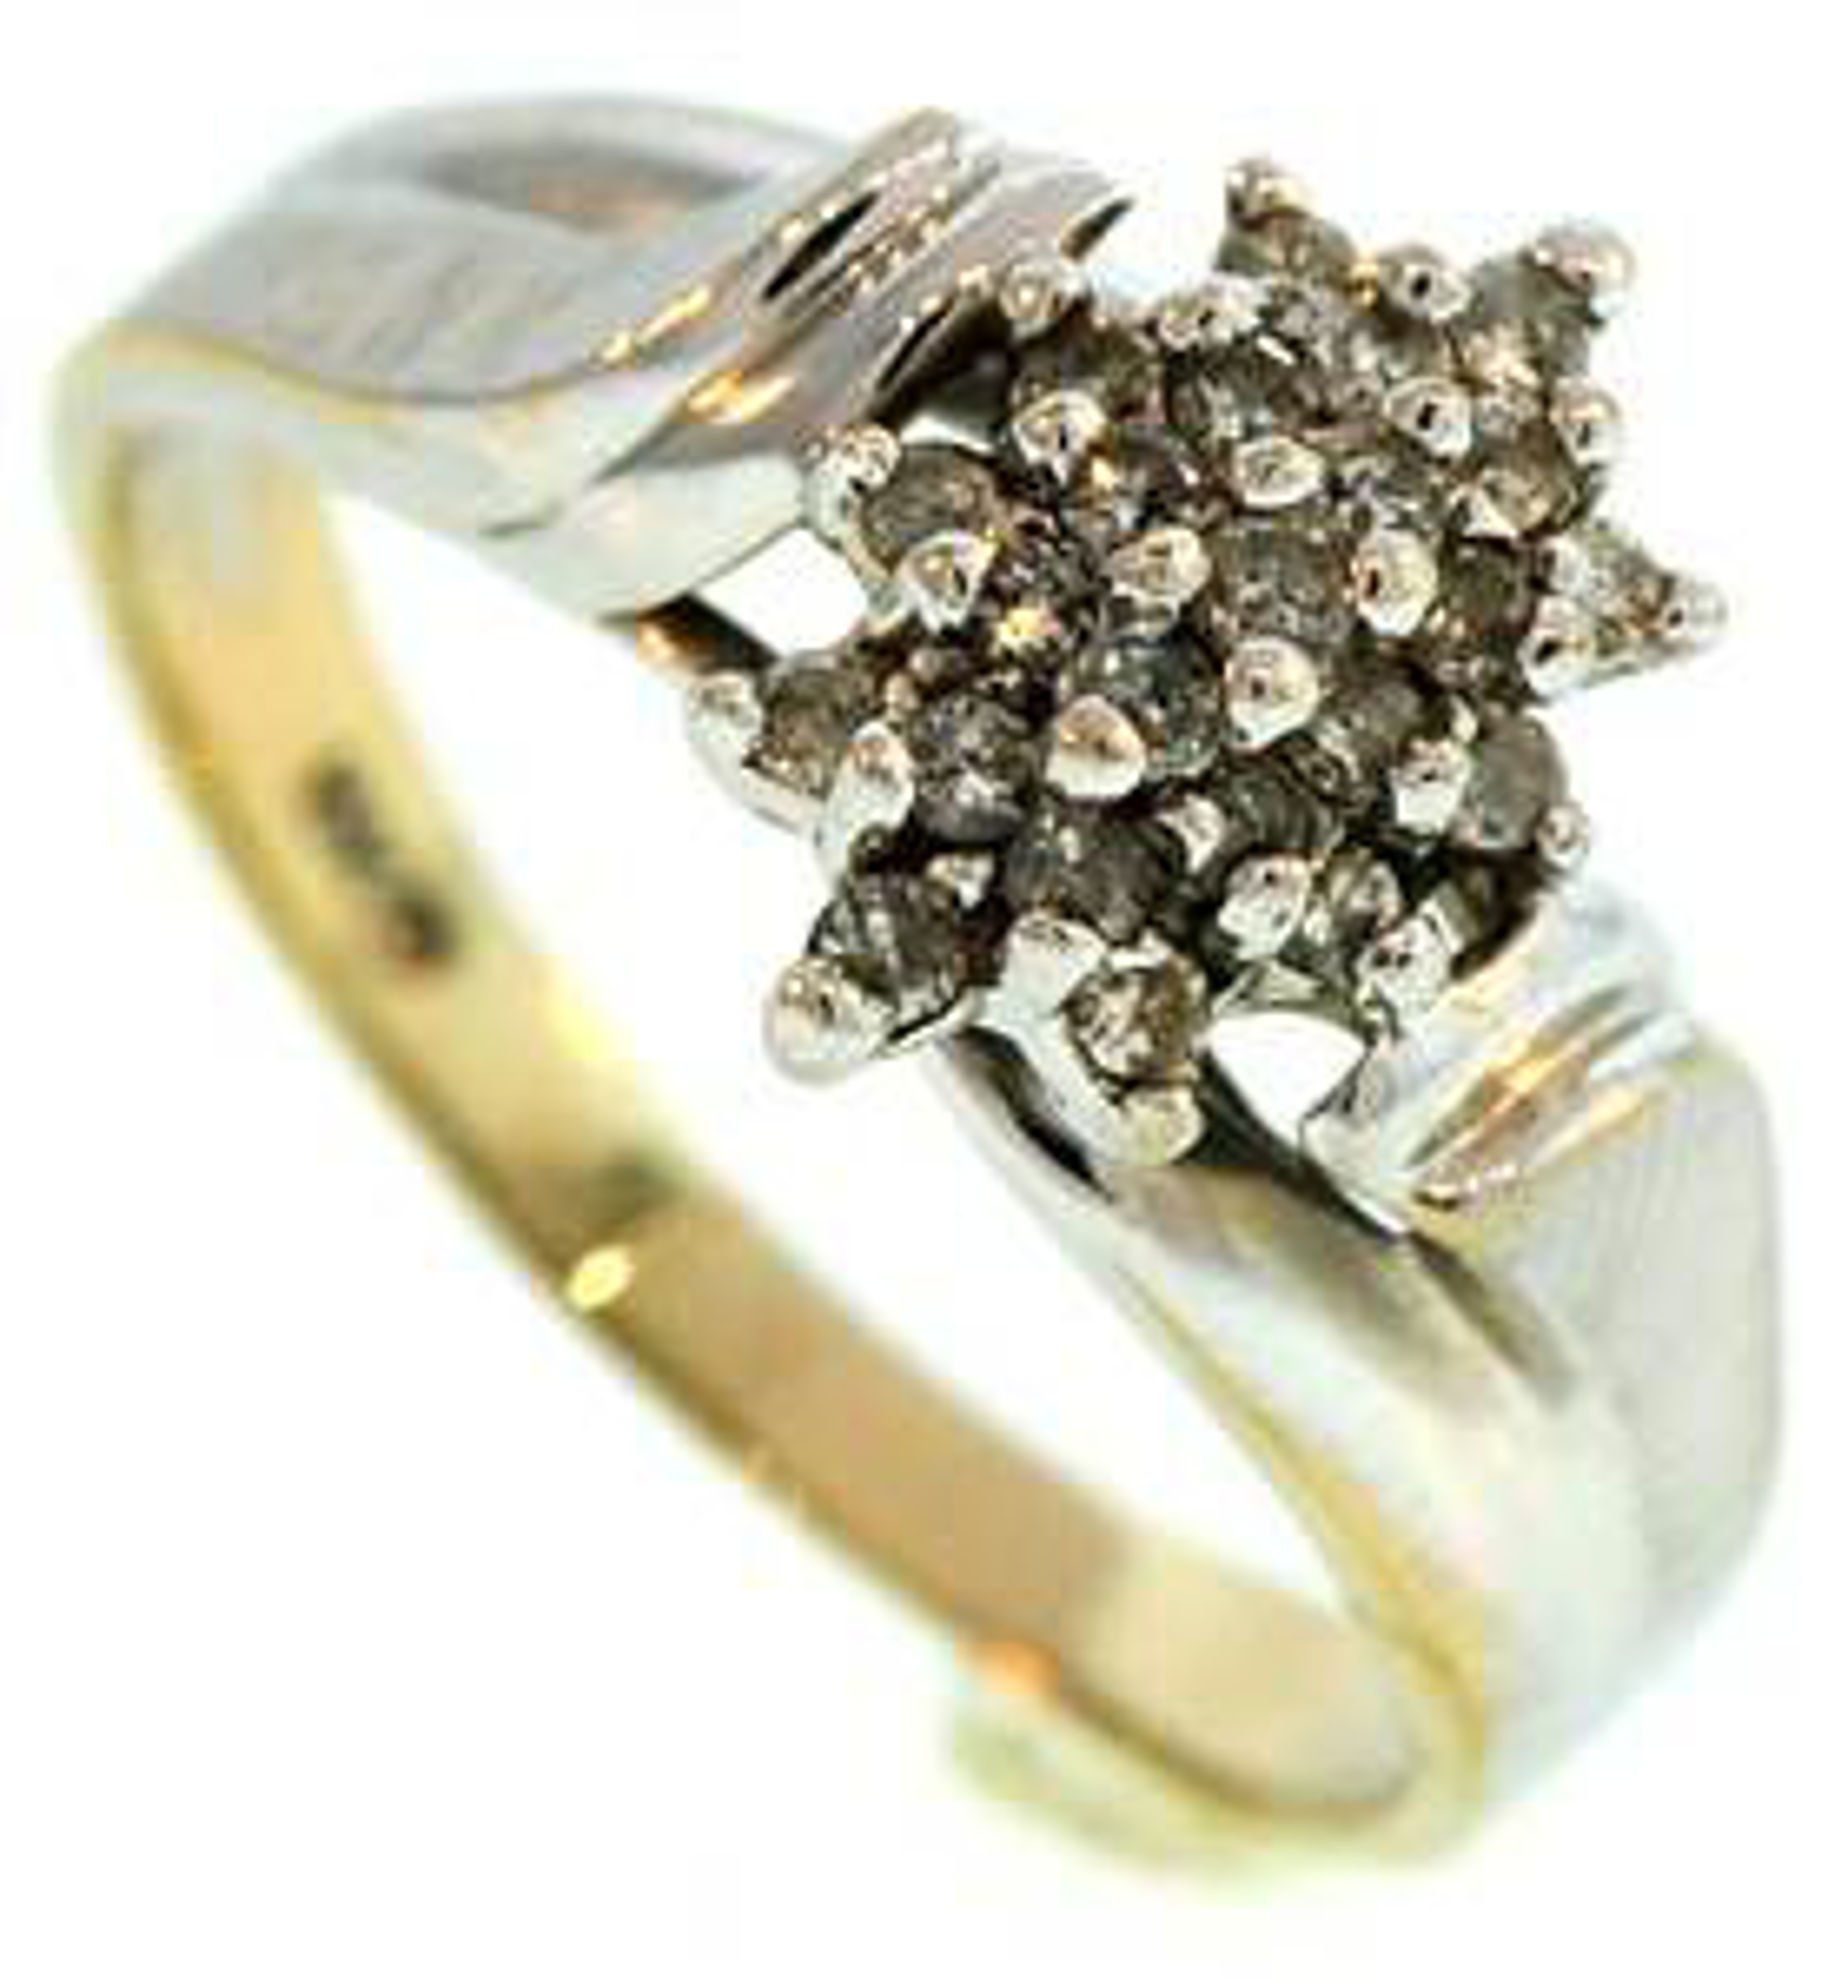 Picture of Ladies' Rings 10kt-1.9 DWT, 3.0 Grams